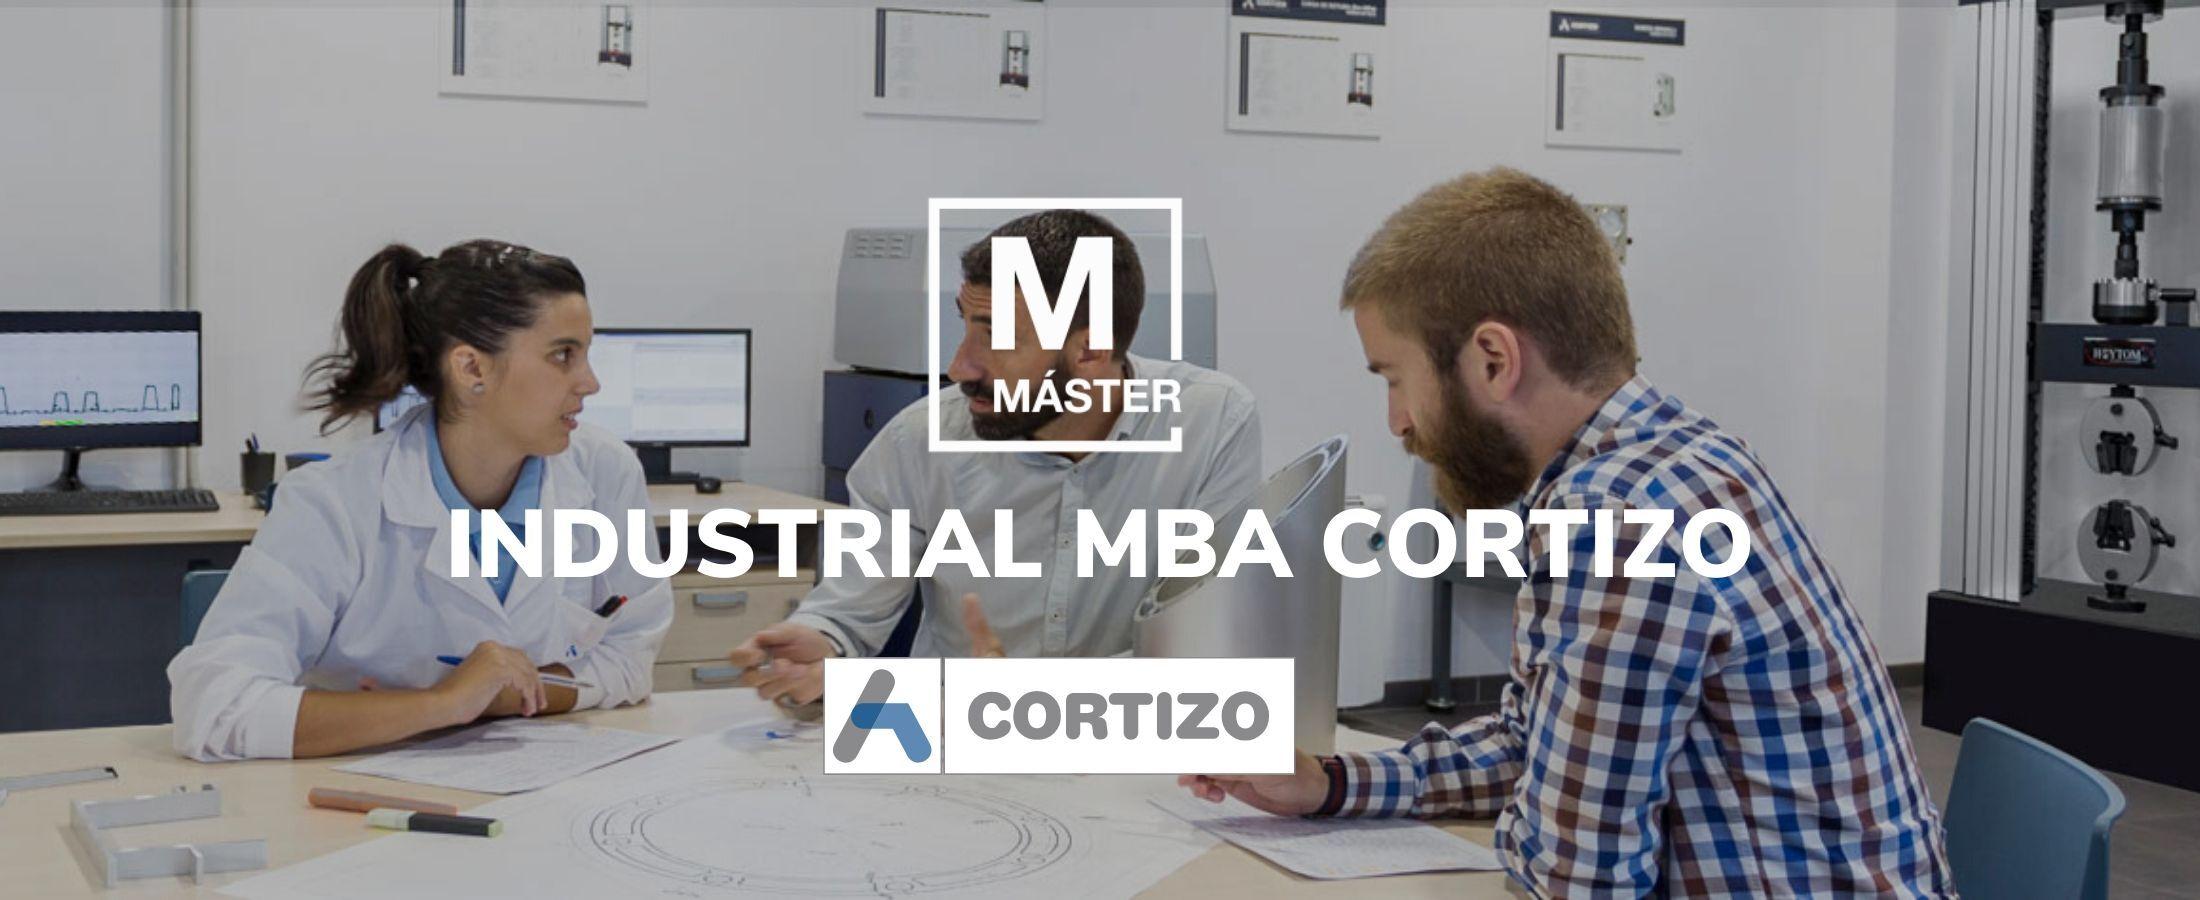 Master Industrial MBA Cortizo